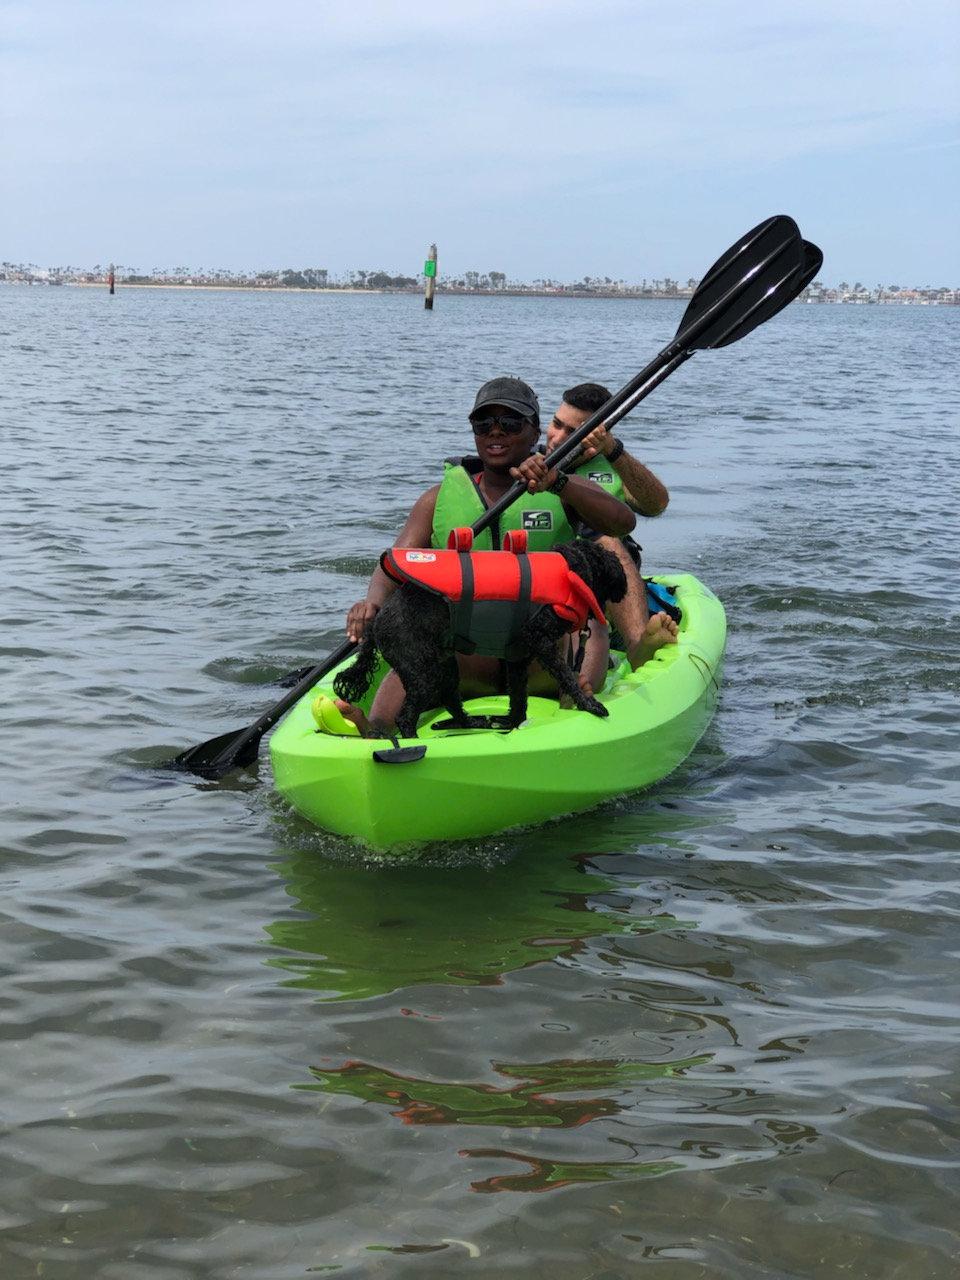 Tandem Kayak  (2 Person) 4 Hr Rental